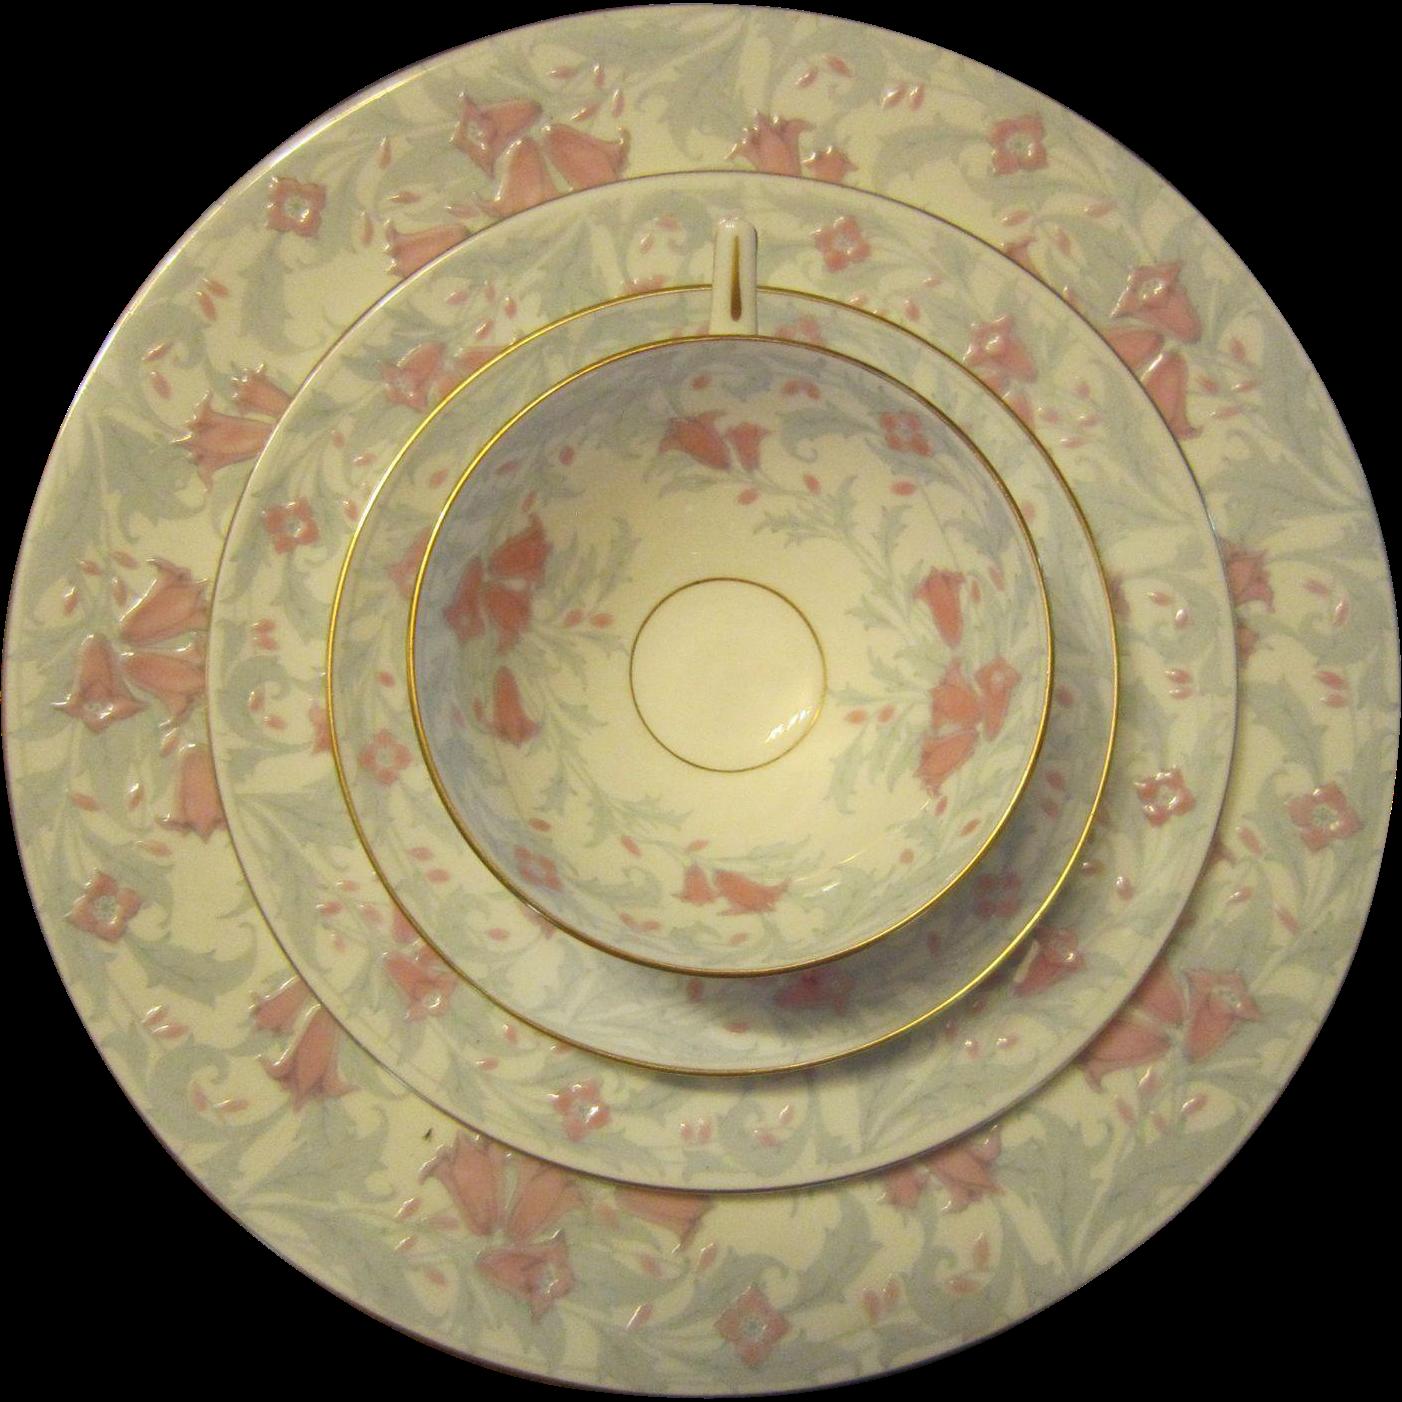 SALE $400, was $800: Bone China 4 Piece Set in the Debutante Pattern X 11 Sets